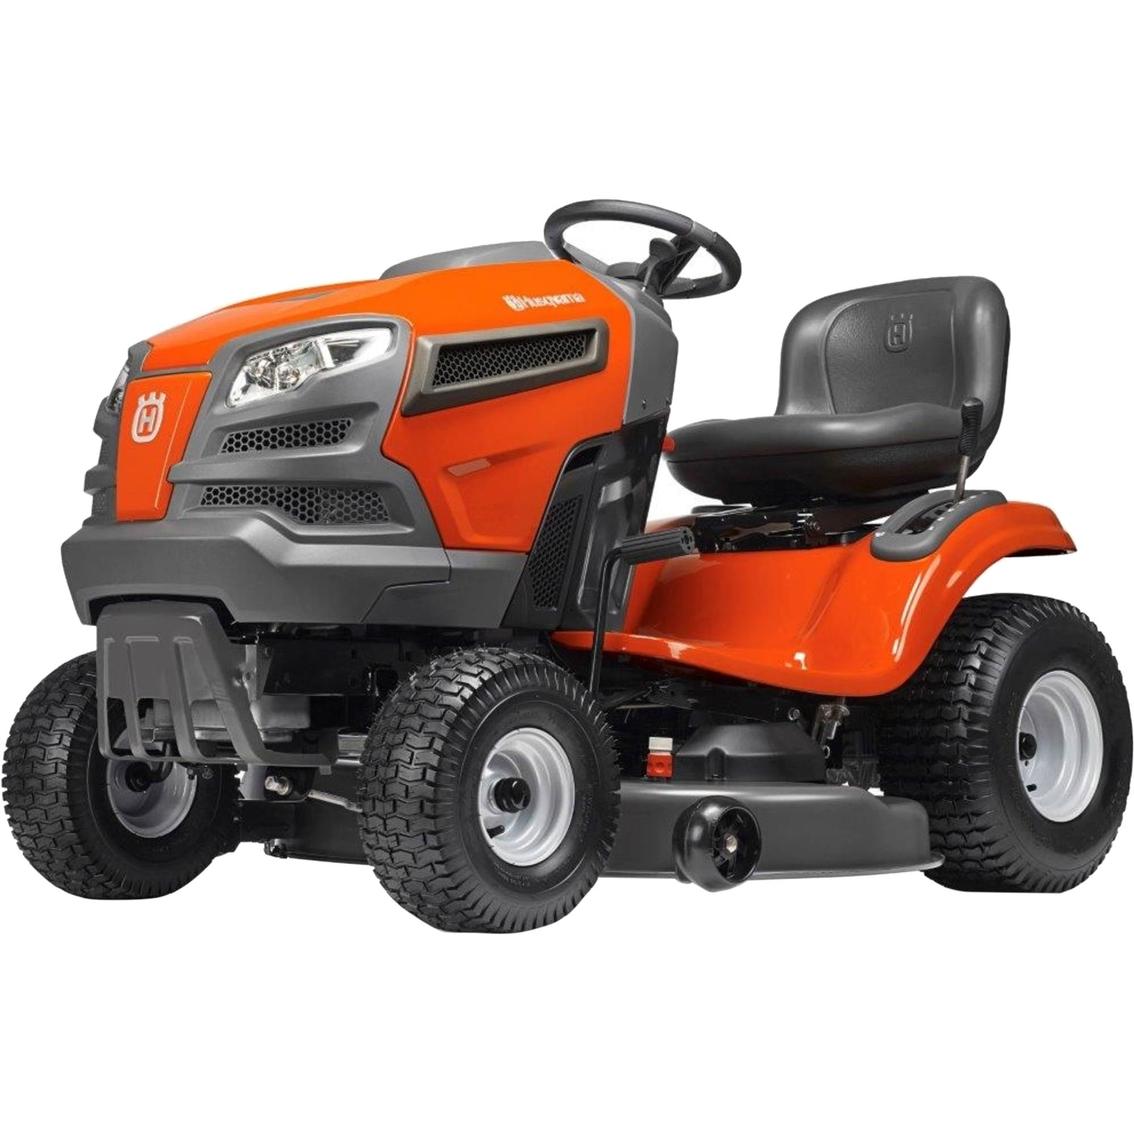 hight resolution of husqvarna 22 hp 46 in riding lawn mower